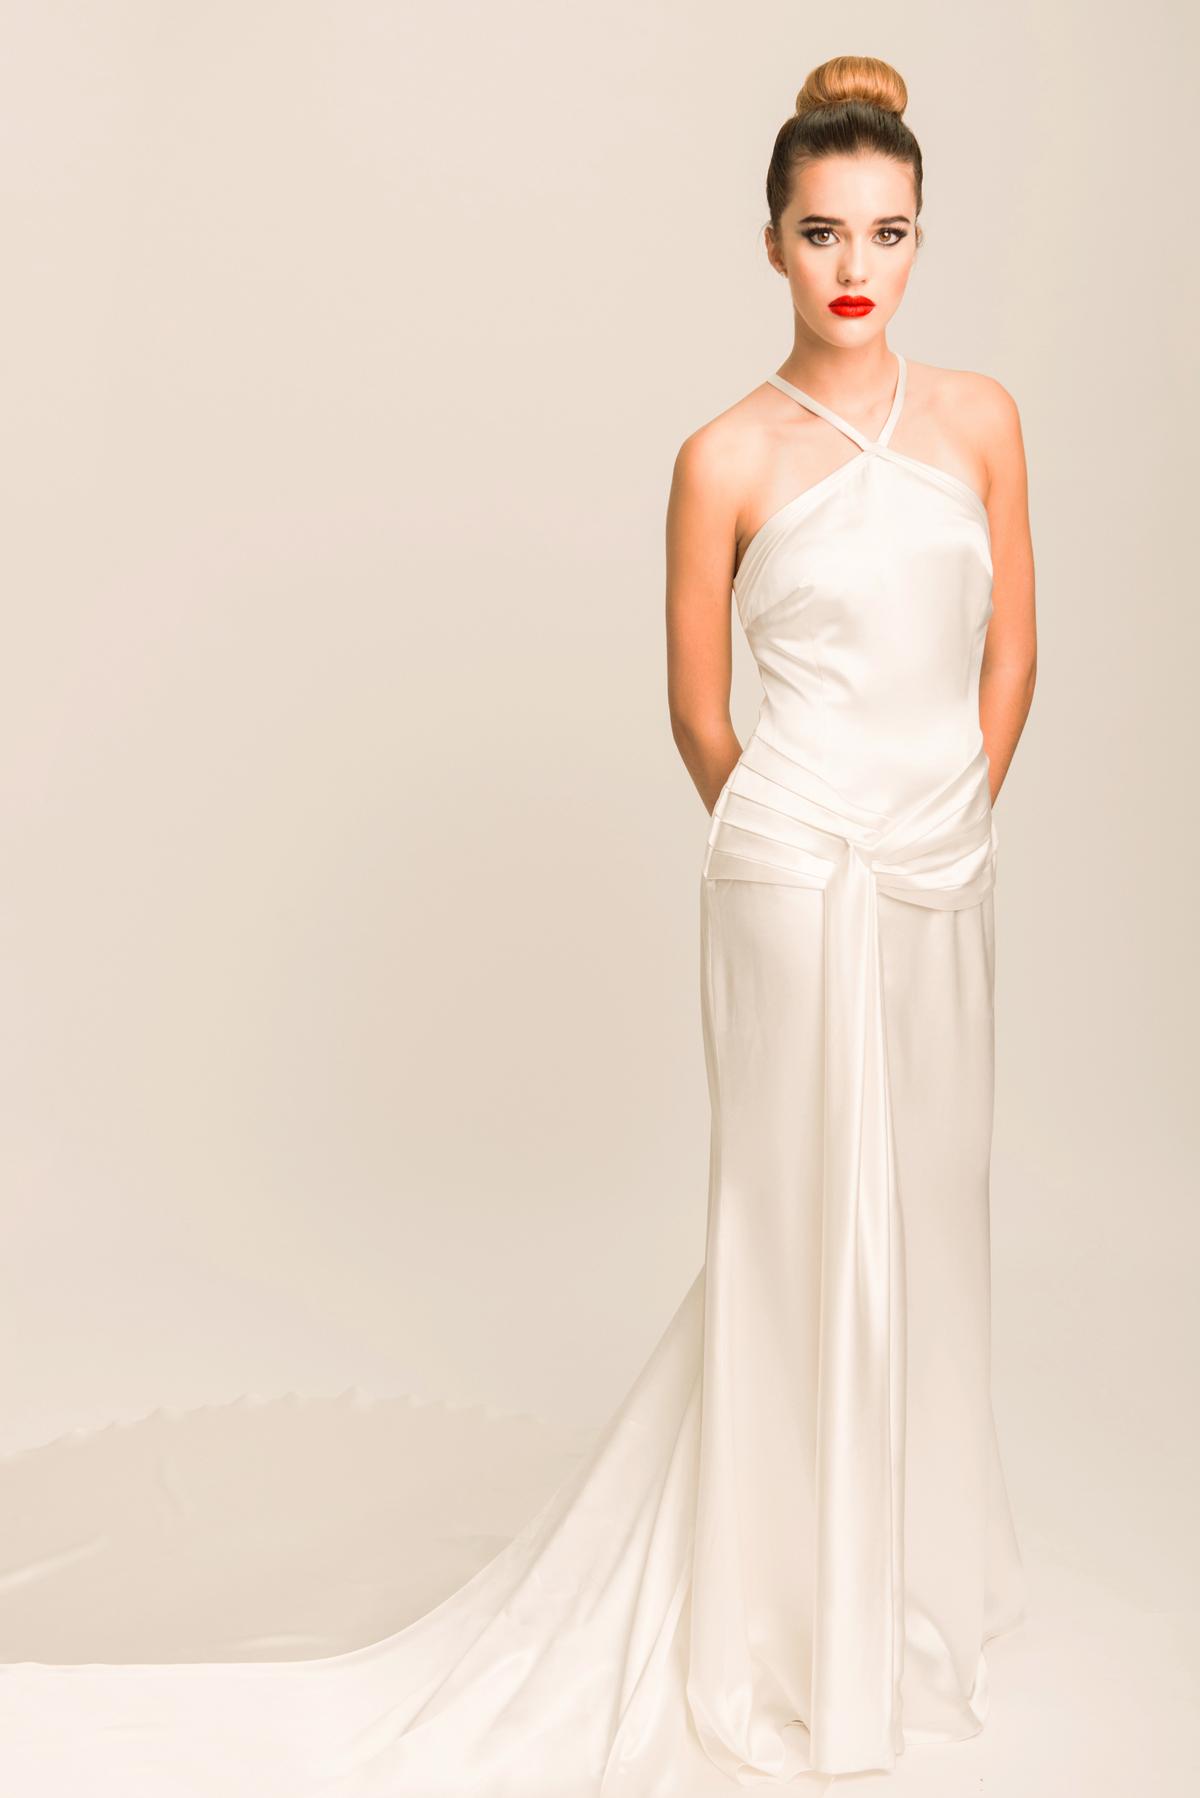 0540a19b Adelais London - Modern Vintage Glamorous and Chic Bridal Fashion ...